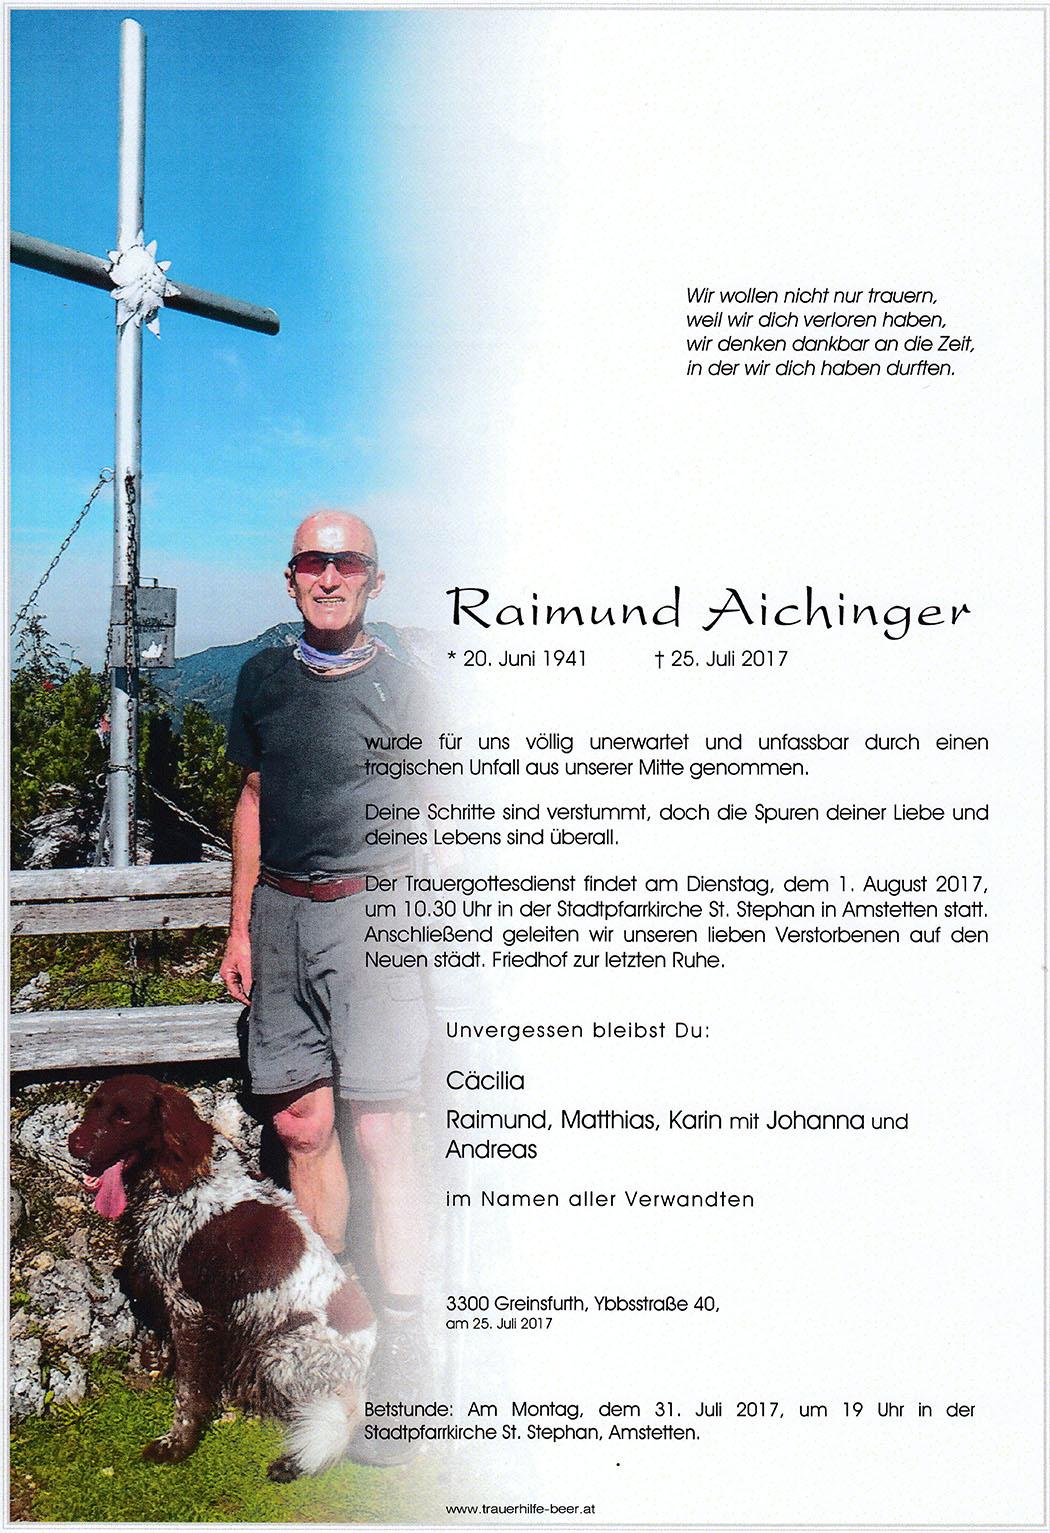 Raimund Aichinger